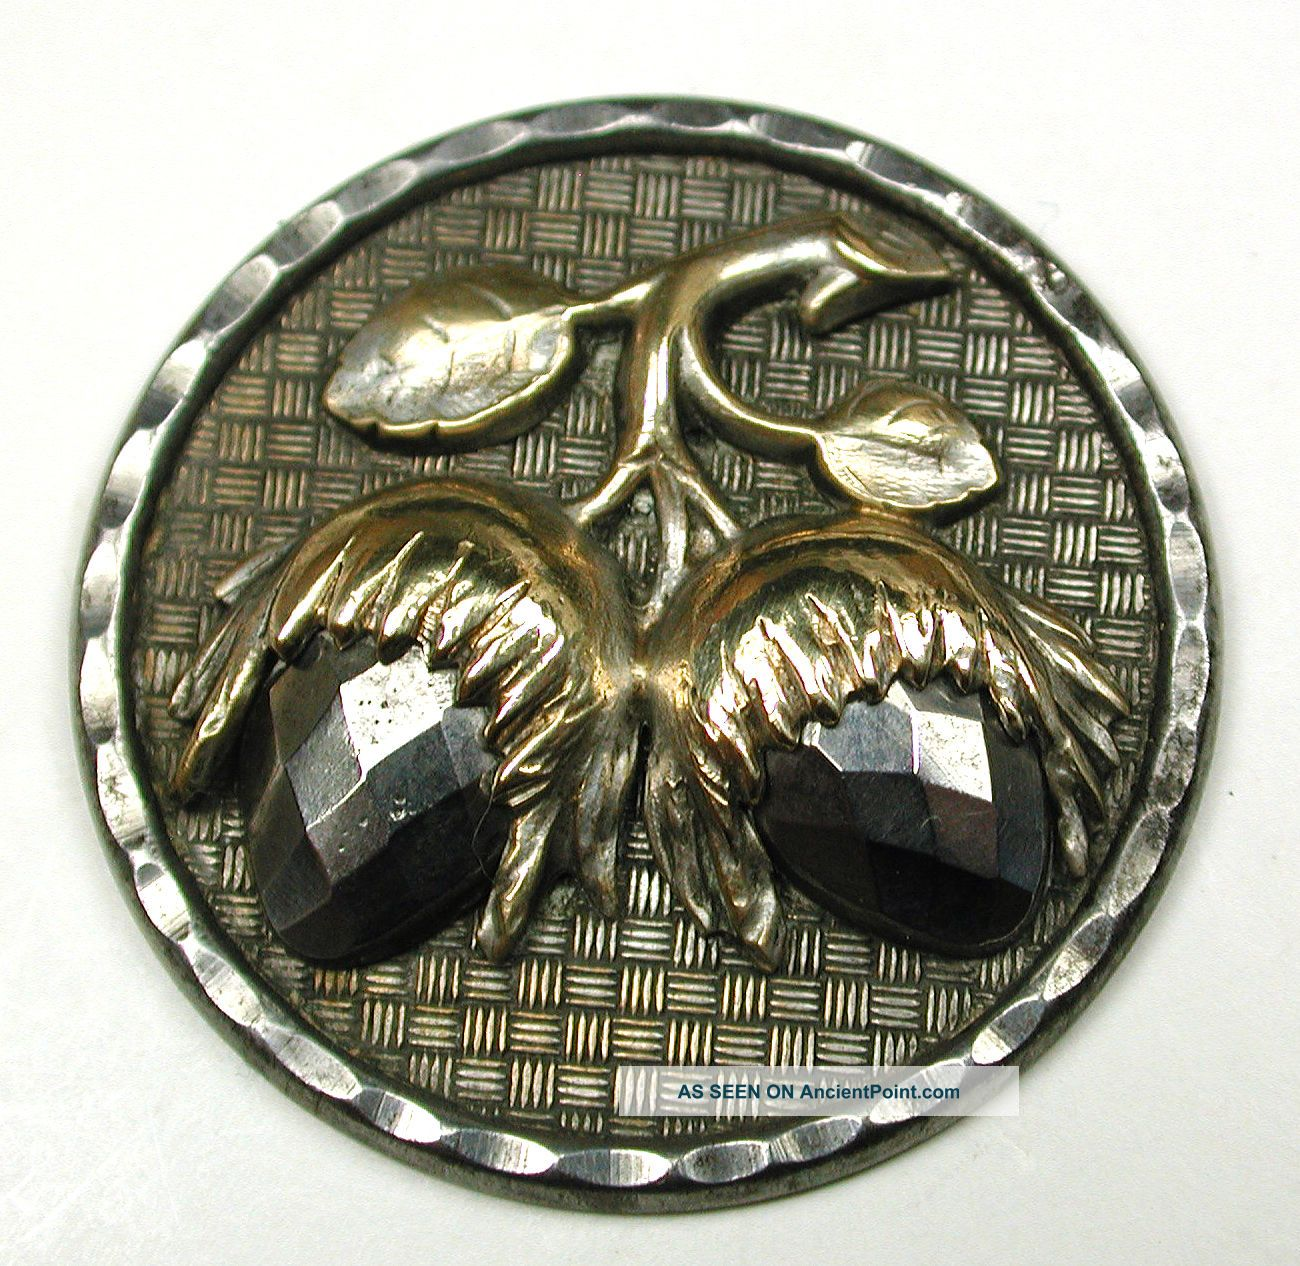 Antique Steel Button Detailed Brass & Cut Steel Hazelnut Design - 1 & 3/16 Buttons photo